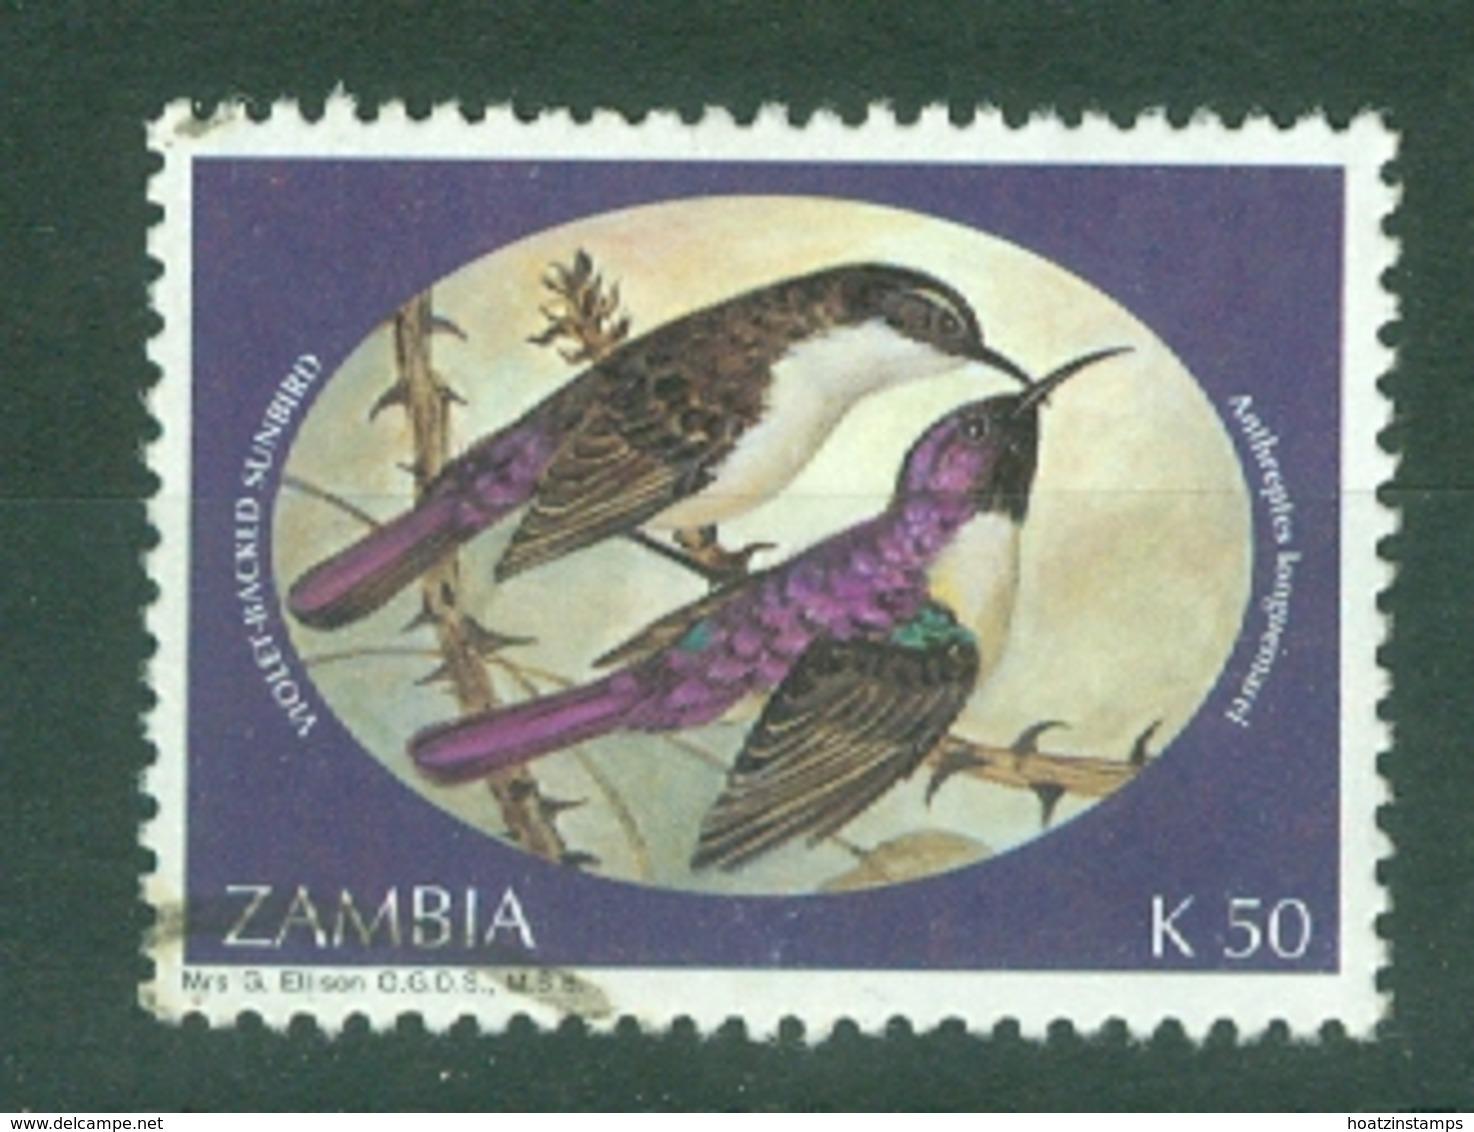 Zambia: 1994   Sunbirds    SG724   K50     Used - Zambia (1965-...)